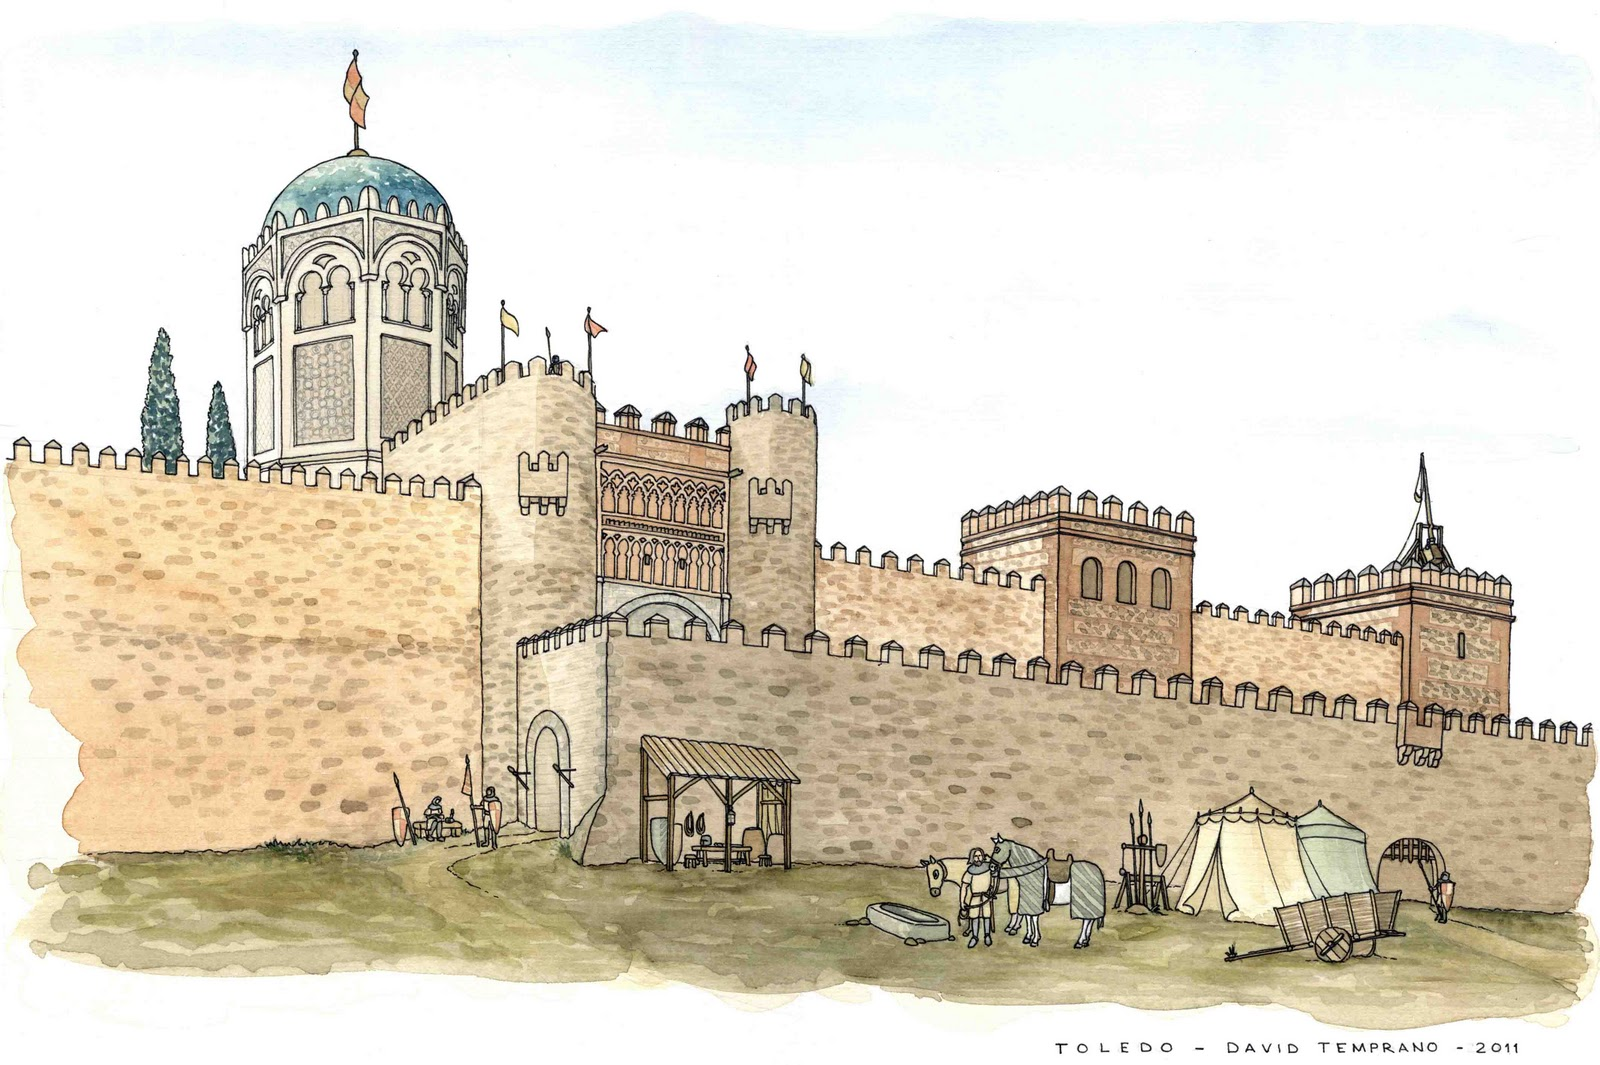 David Temprano: Toledo. Cruce de destinos